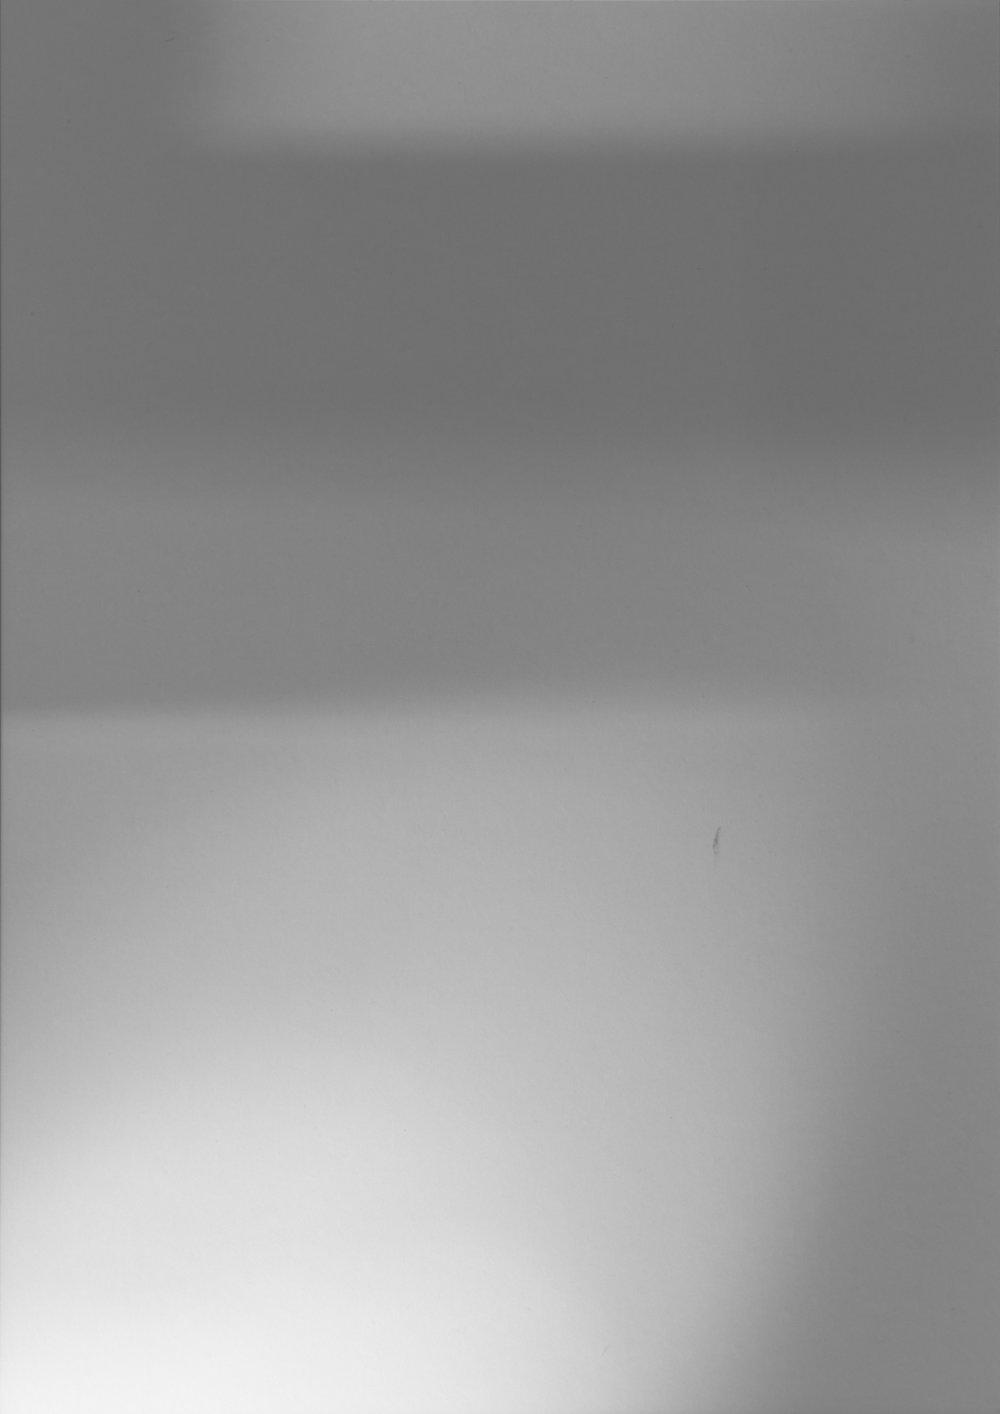 L1010220.jpg